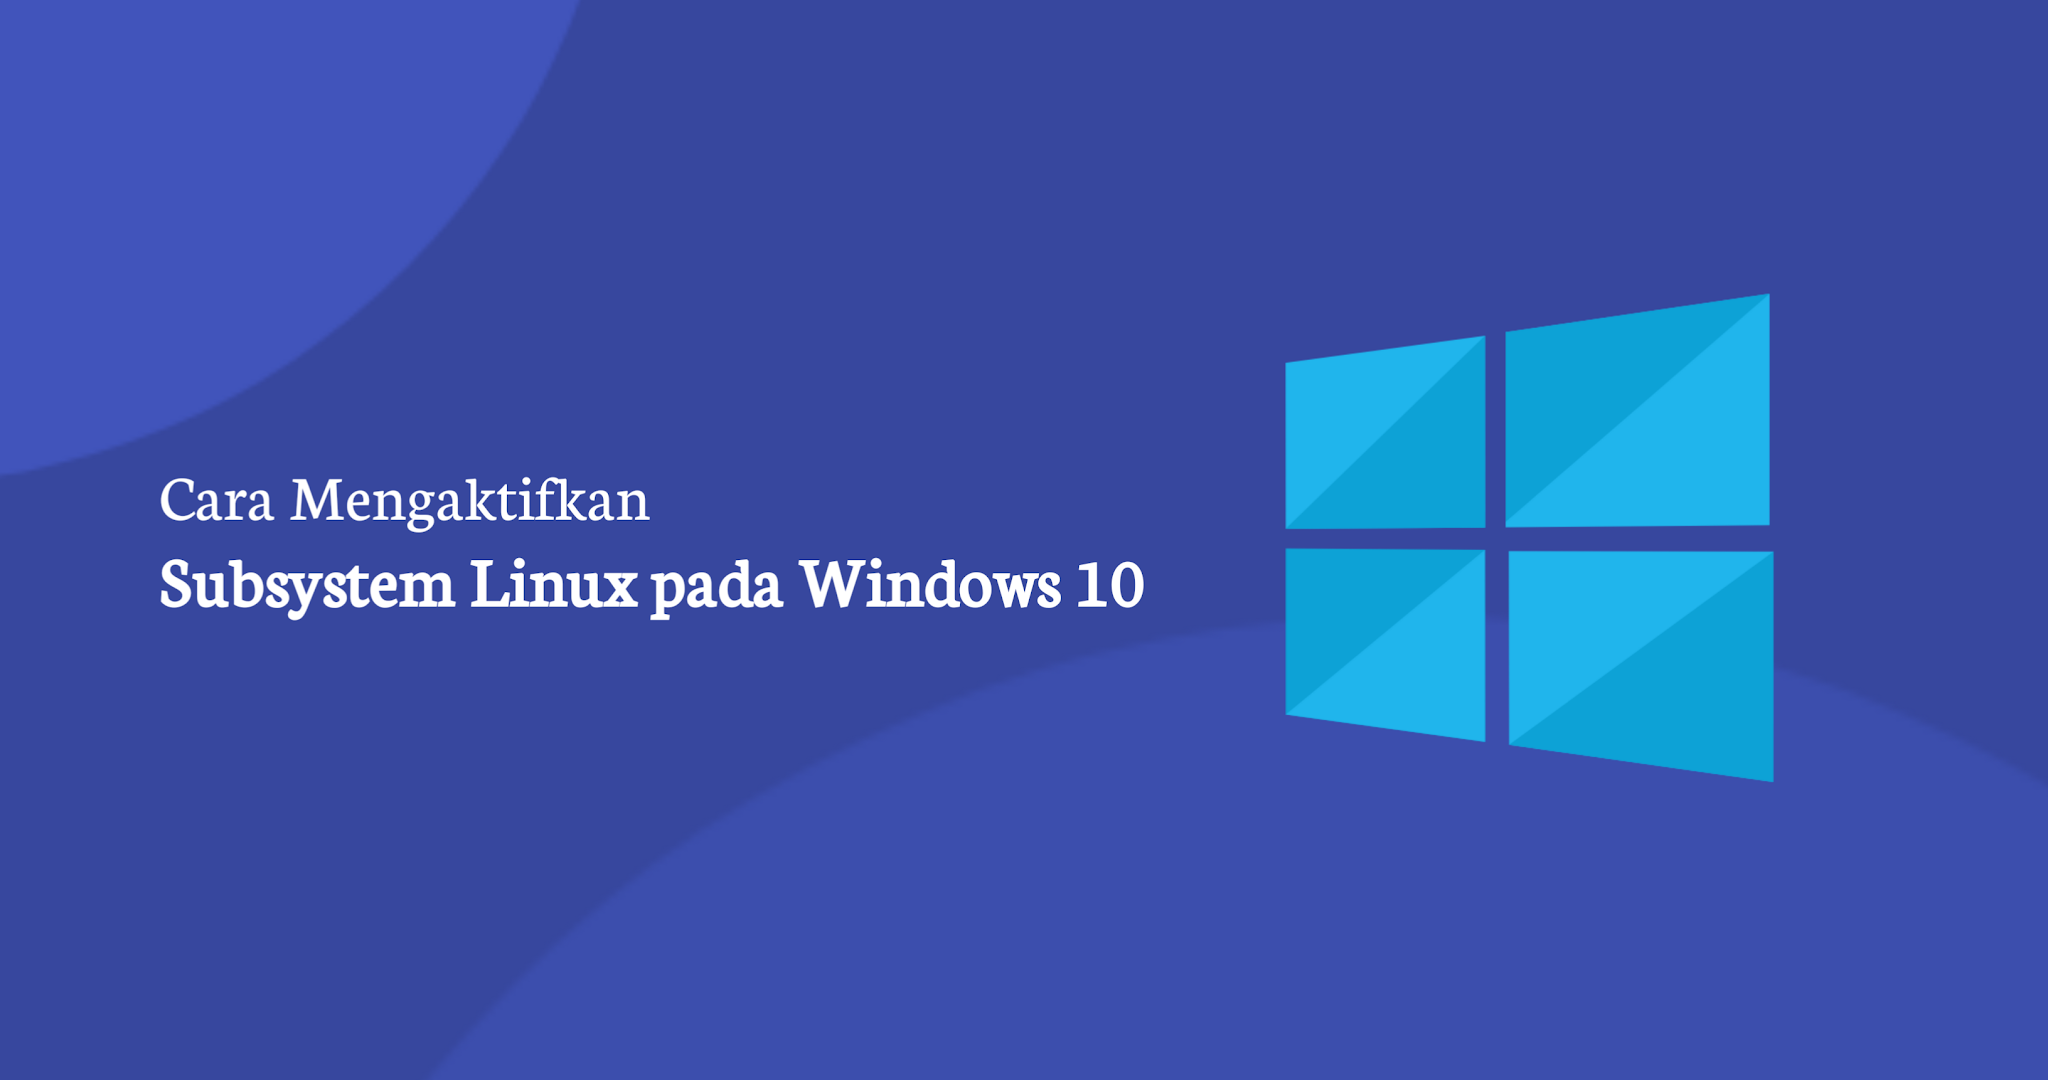 Cara Mengaktifkan Subsystem Linux di Windows 10